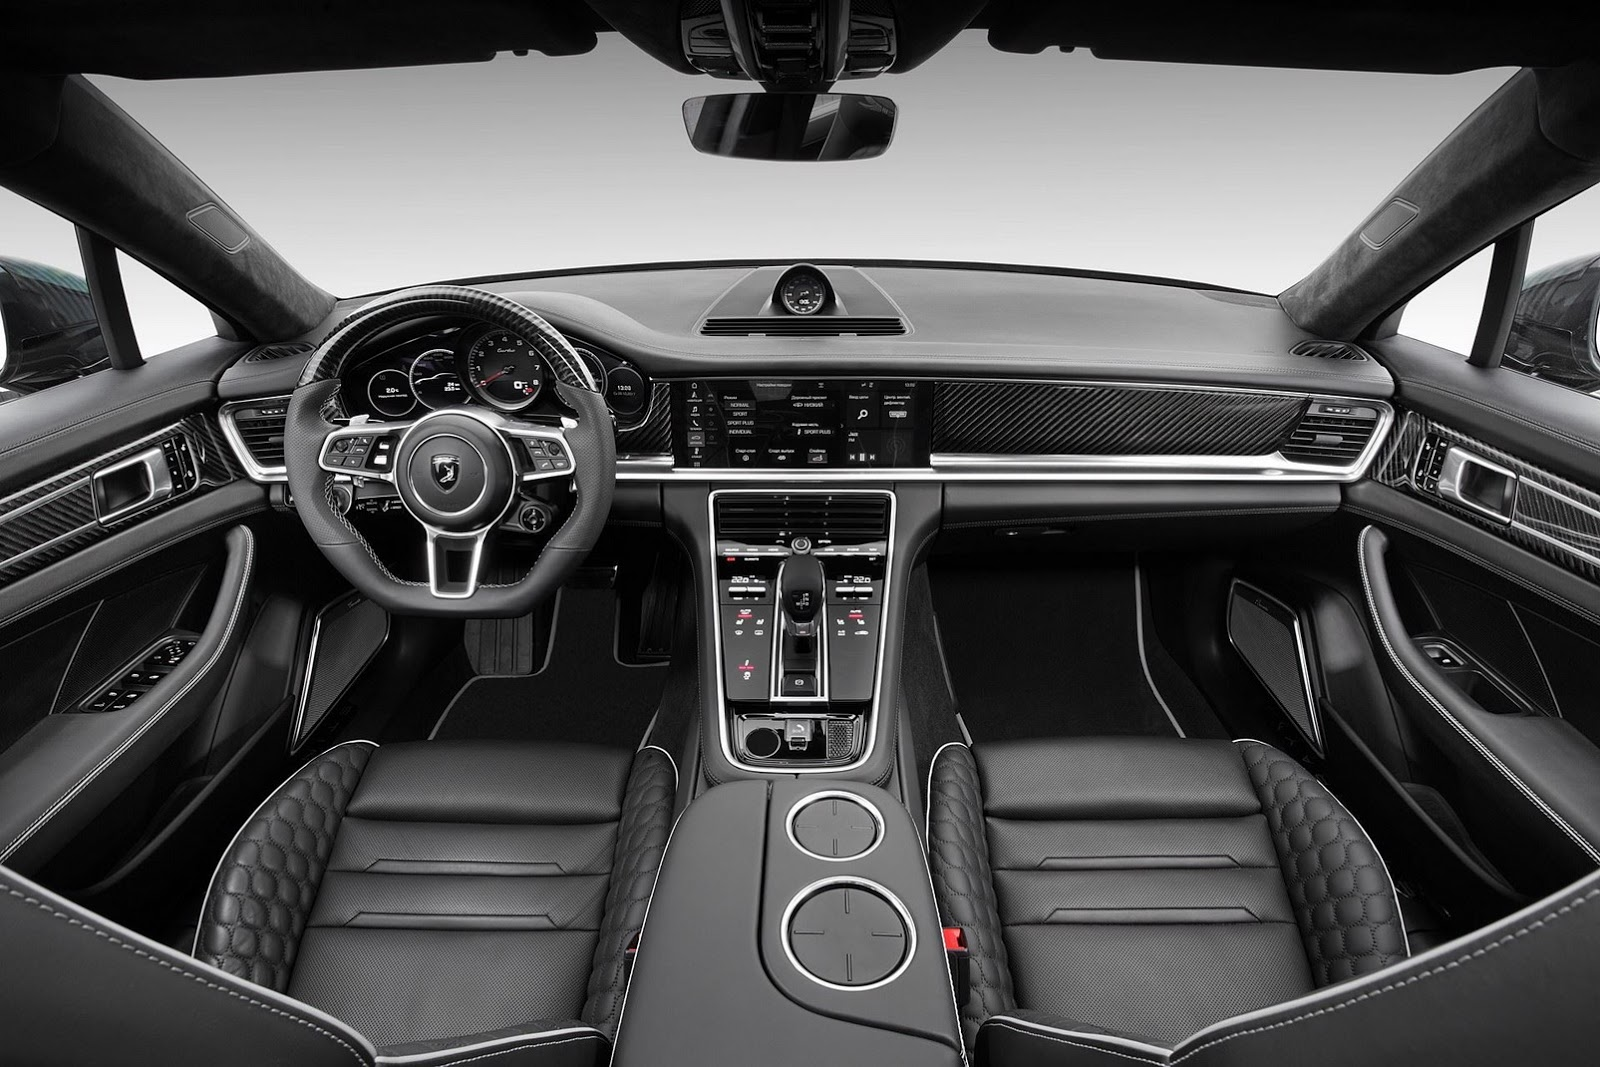 new porsche panamera turbo topcar tuning has custom interior costs 235 000 autoevolution. Black Bedroom Furniture Sets. Home Design Ideas